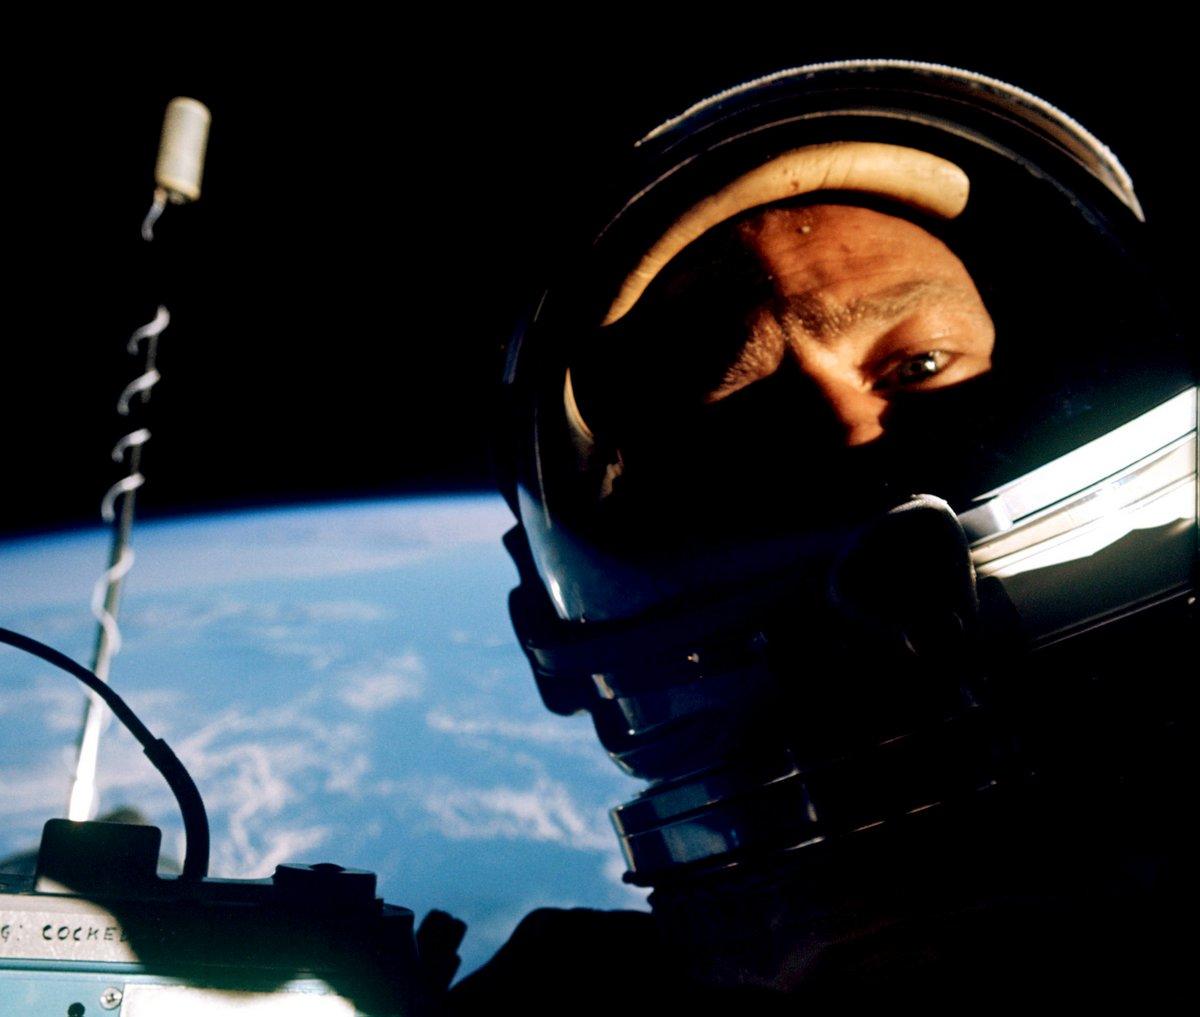 Vintage famous Buzz Aldrin spacewalk selfie from Nov 12 1966 Buzz Aldrin-NASA at ClickAmericana com